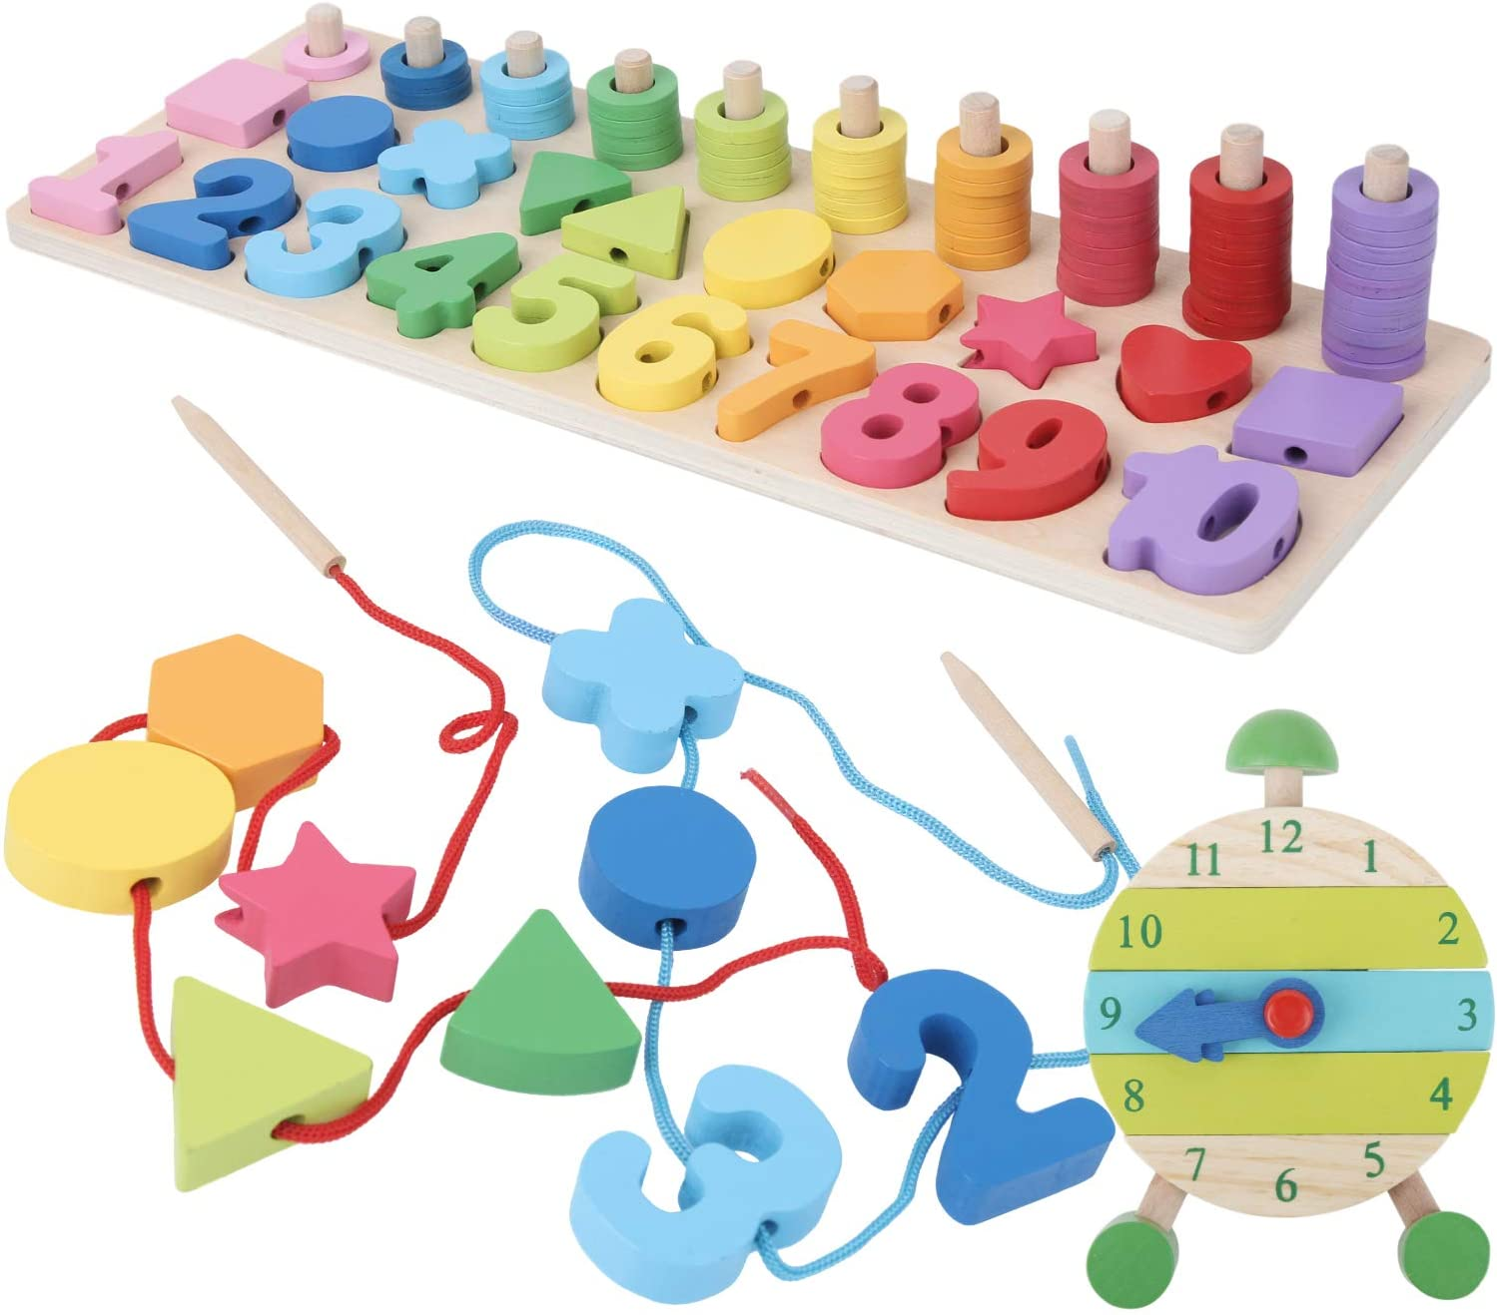 de Madera Digital de Dibujo de Aprendizaje Caja con Multi Funciones OMZGXGOD Montessori matem/áticas Juguete Juego de Juguetes de Madera Aprendiendo Matem/áticas Educaci/ón Temprana